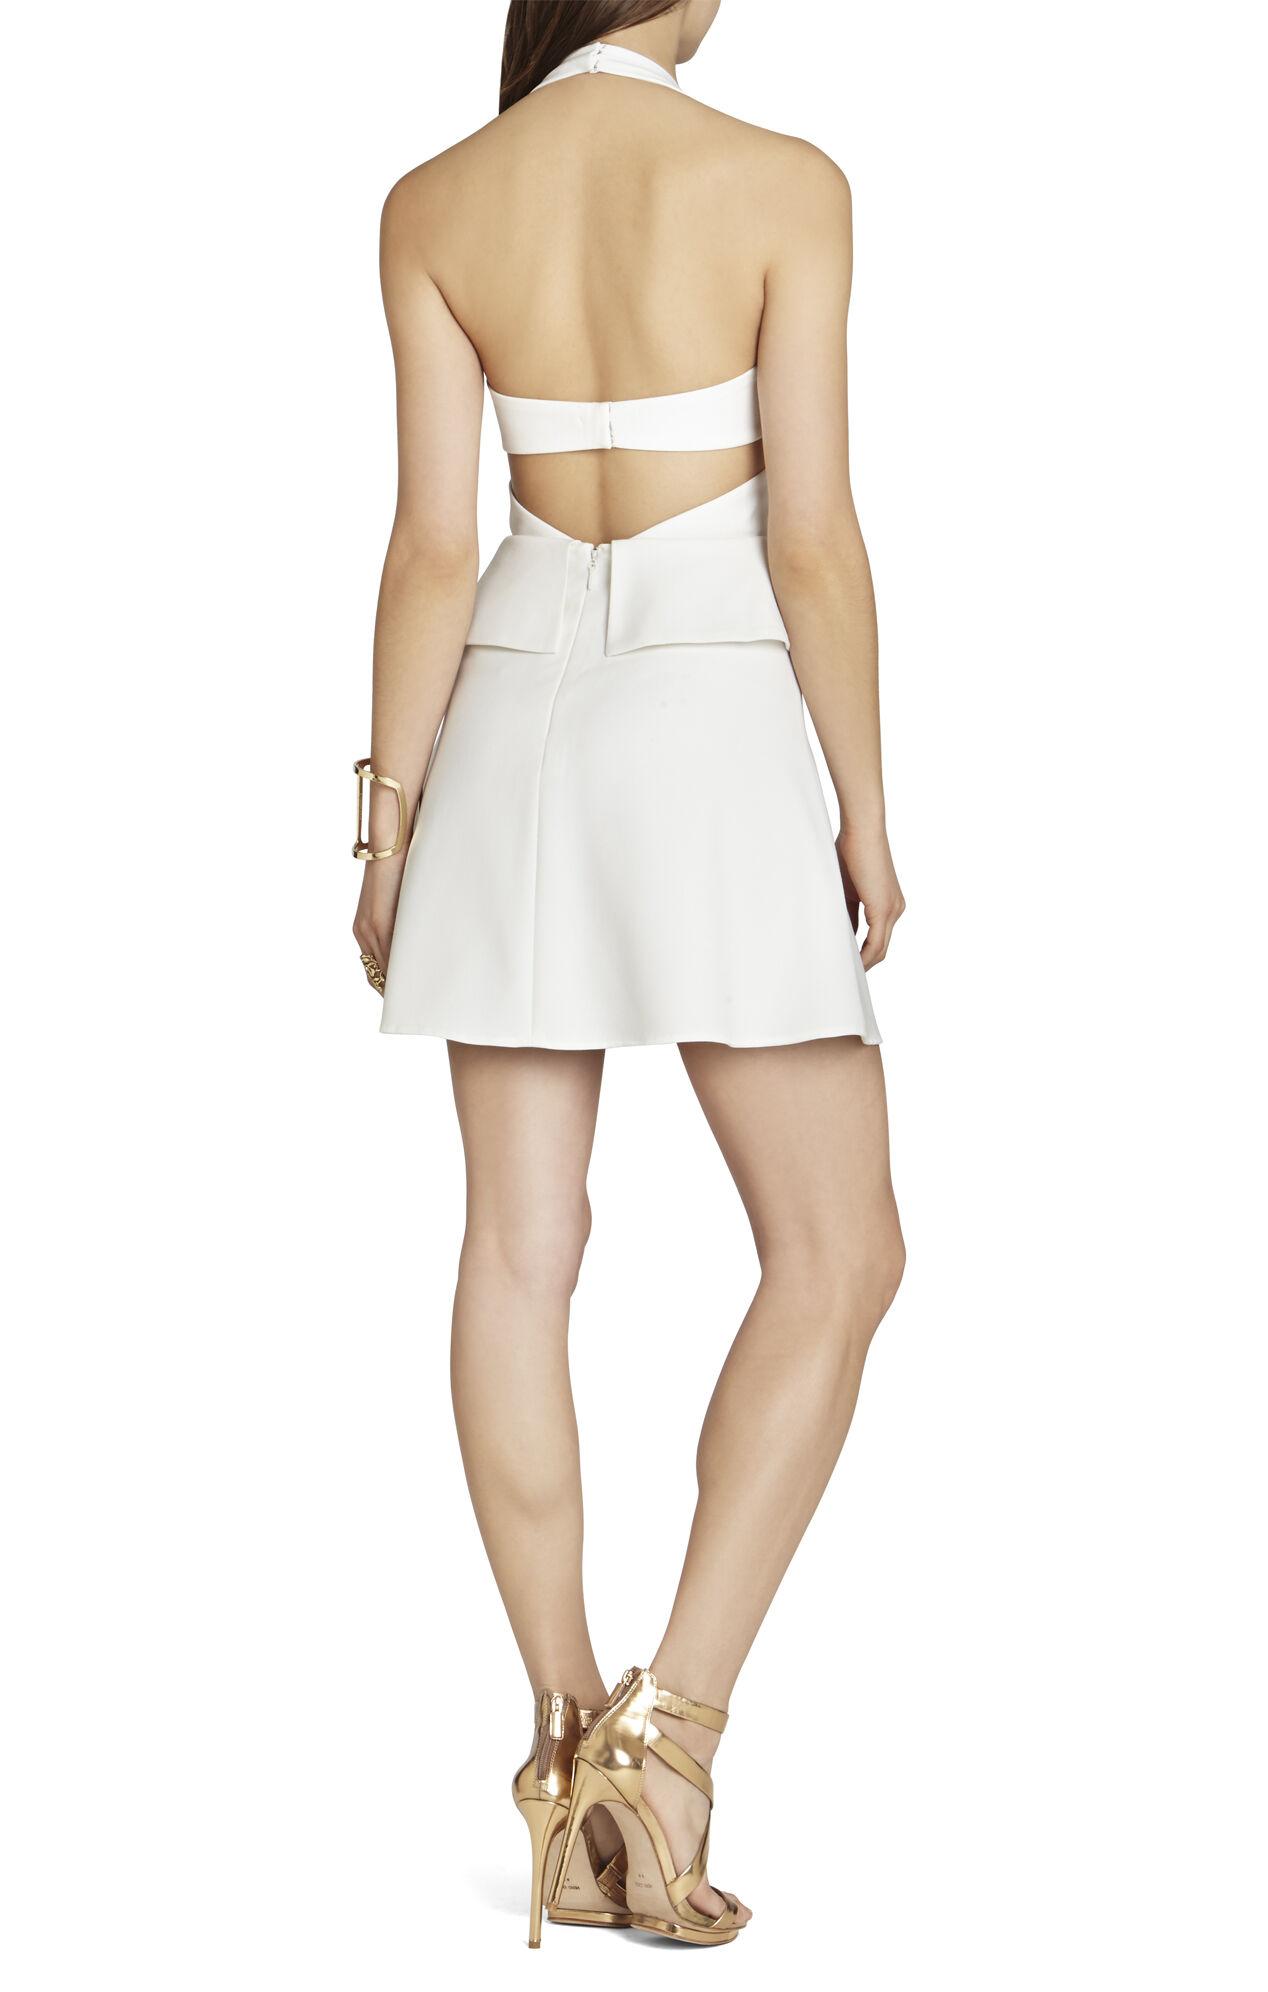 Denisa Cutout Halter Dress